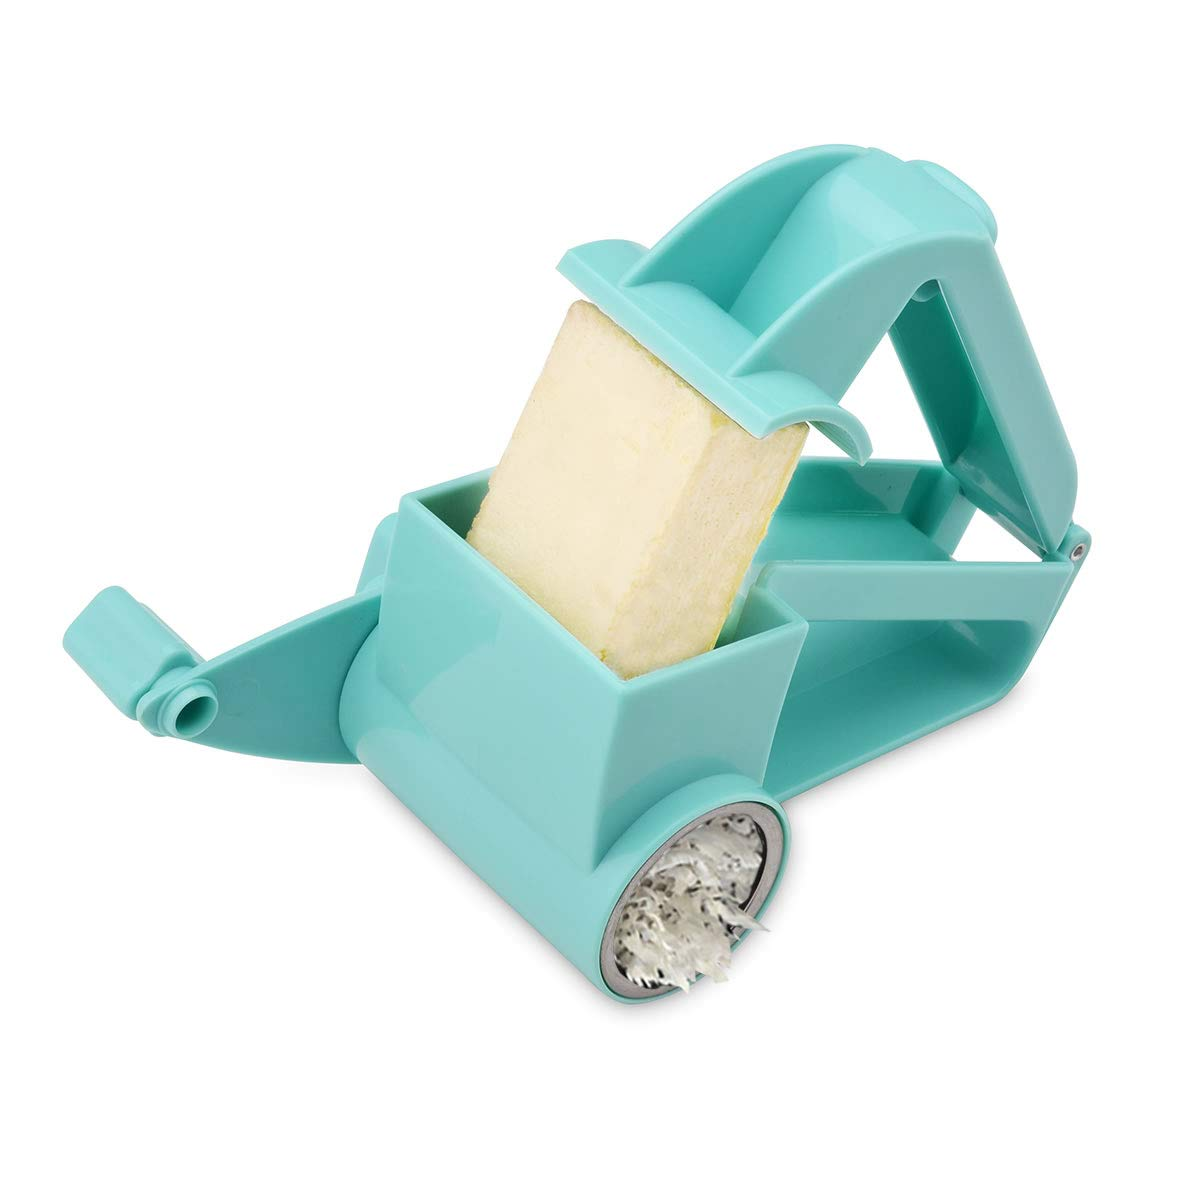 Oumosi grattugia formaggio Rotary Ginger affettatrice grattugia cutter Shredder Blue